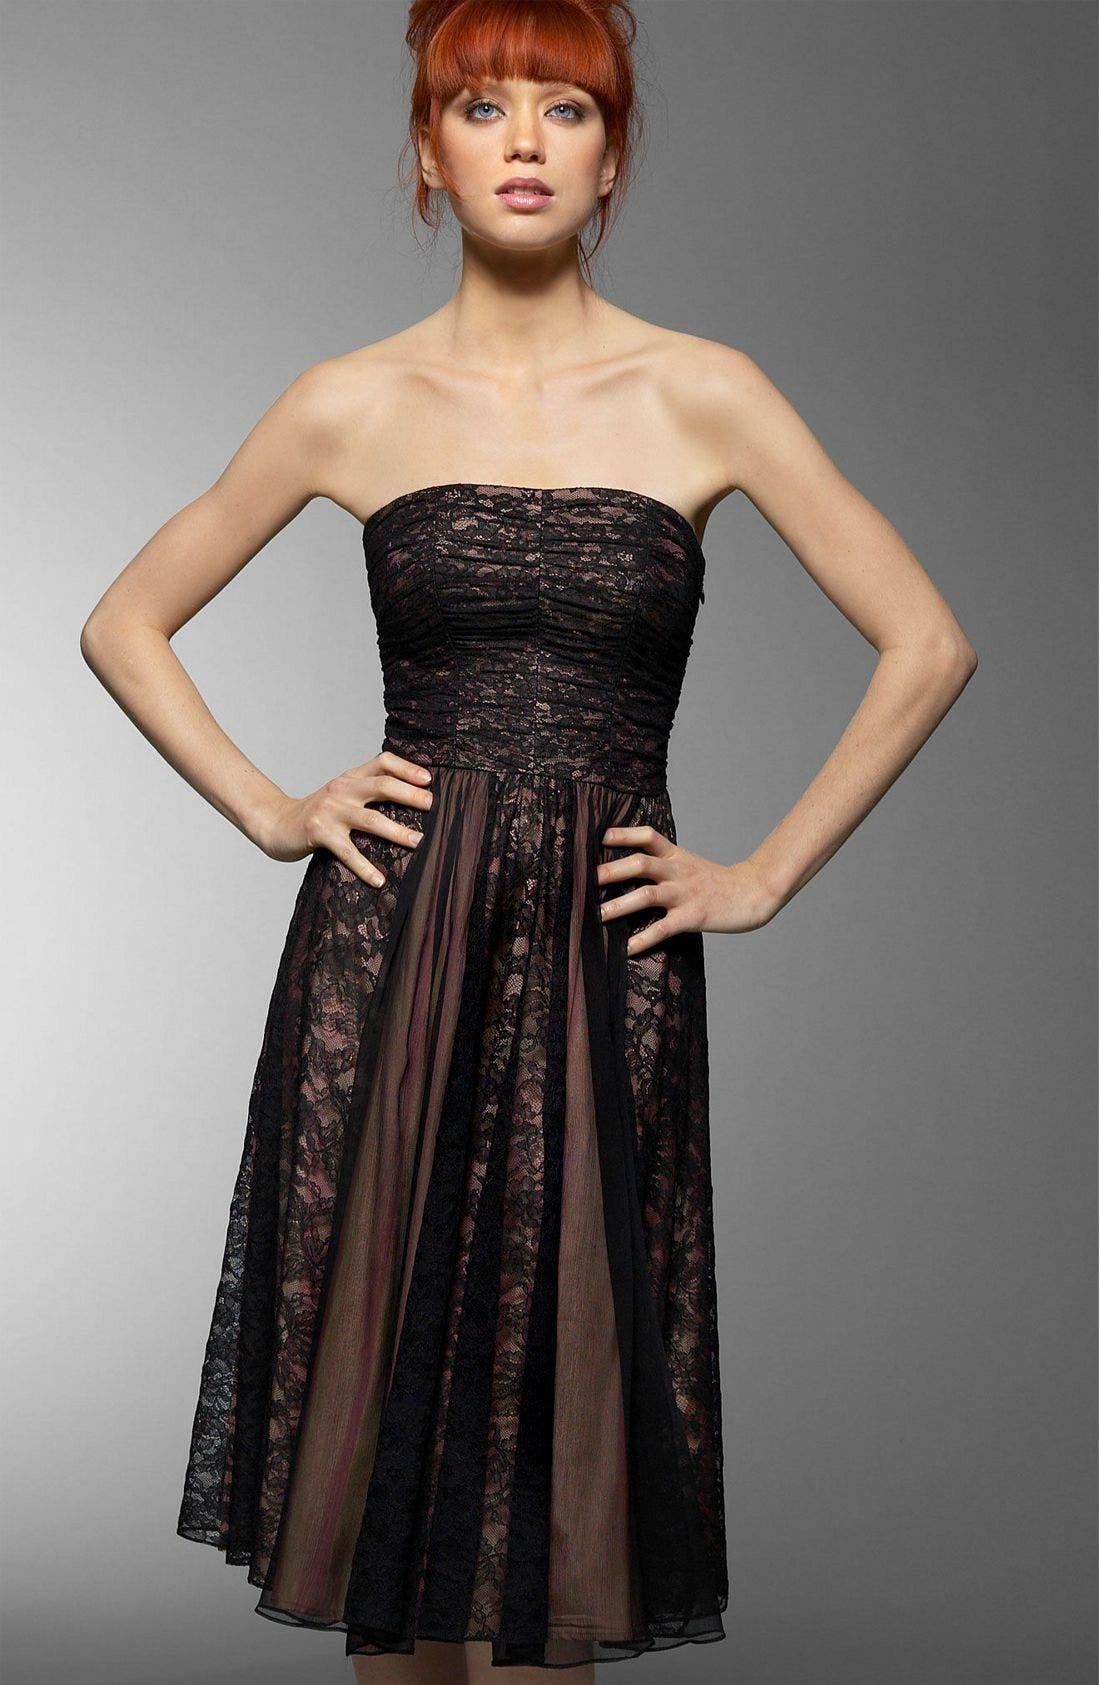 Alternate Image 1 Selected - Nanette Lepore Chantilly Lace Dress